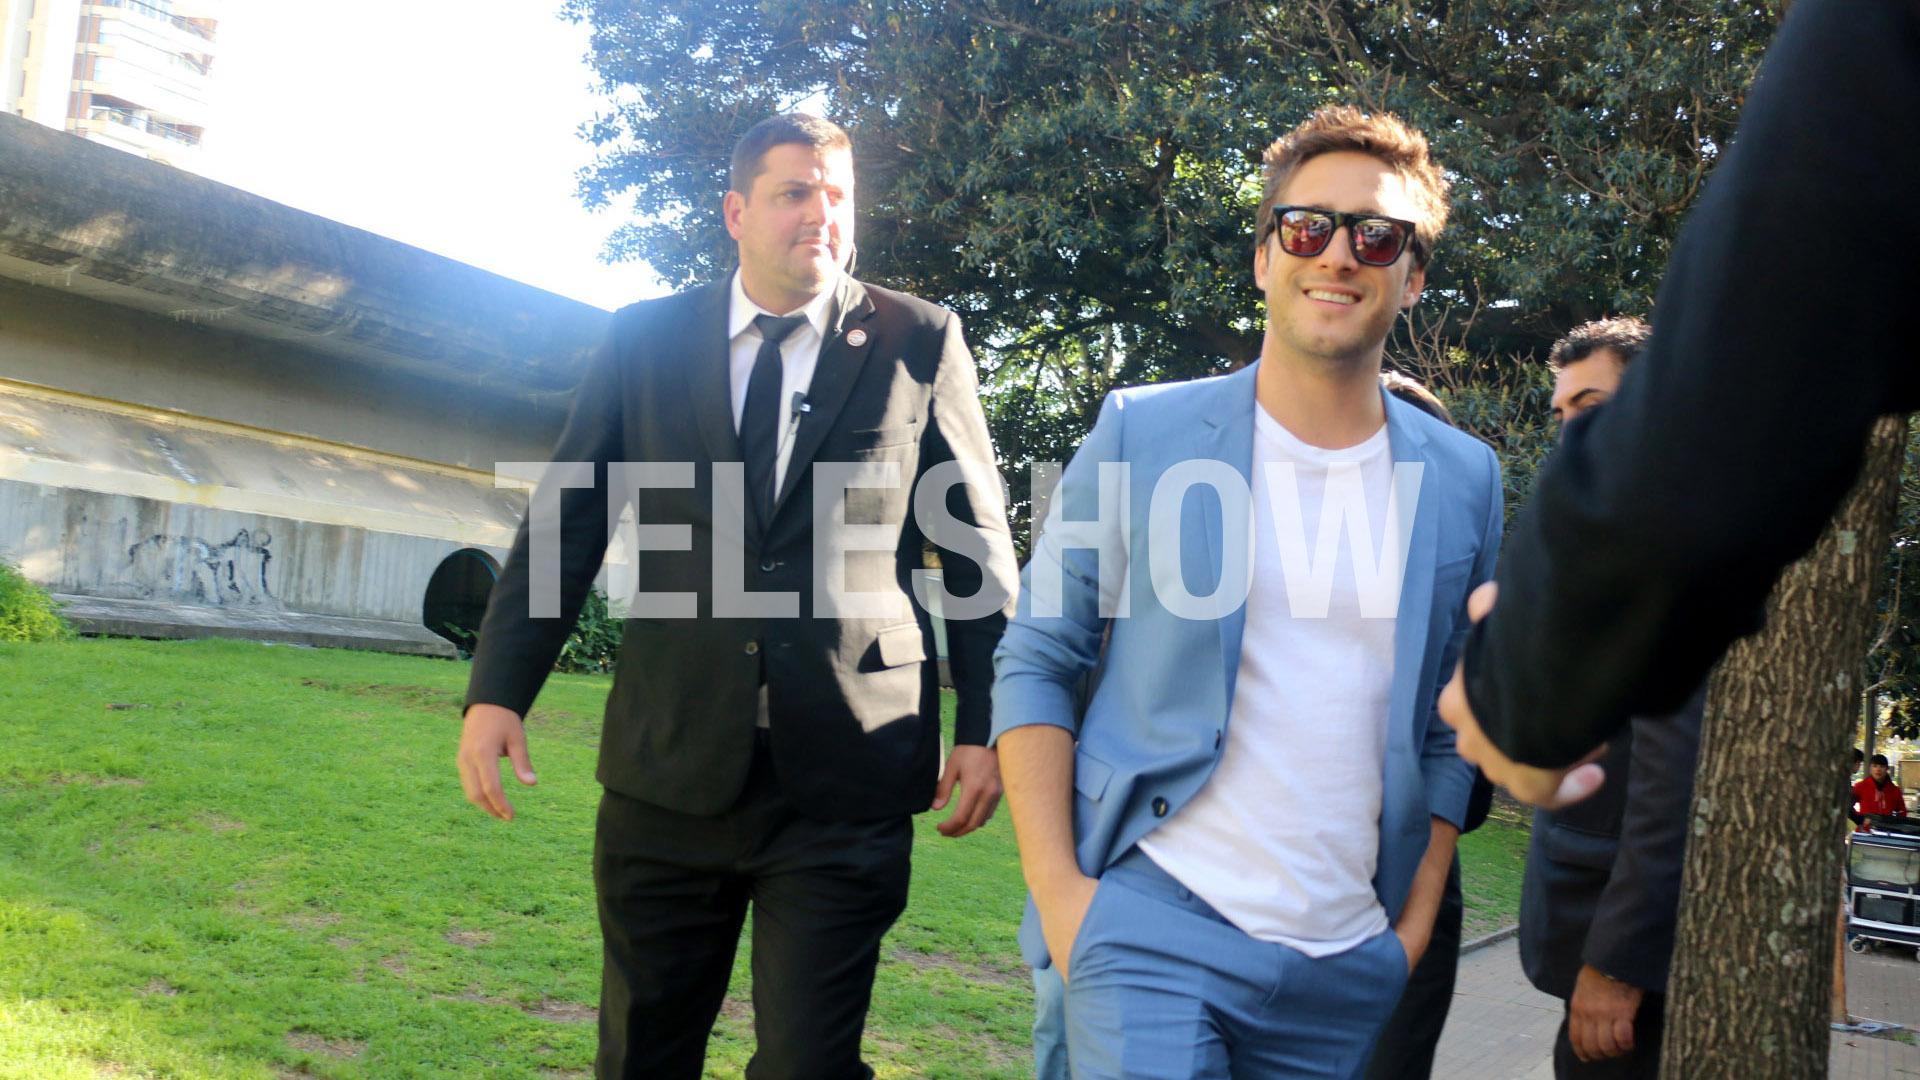 Diego Bonetallegó a la Argentina el domingo a la noche para grabar un comercial (Verónica Guerman y China Soler / Teleshow)